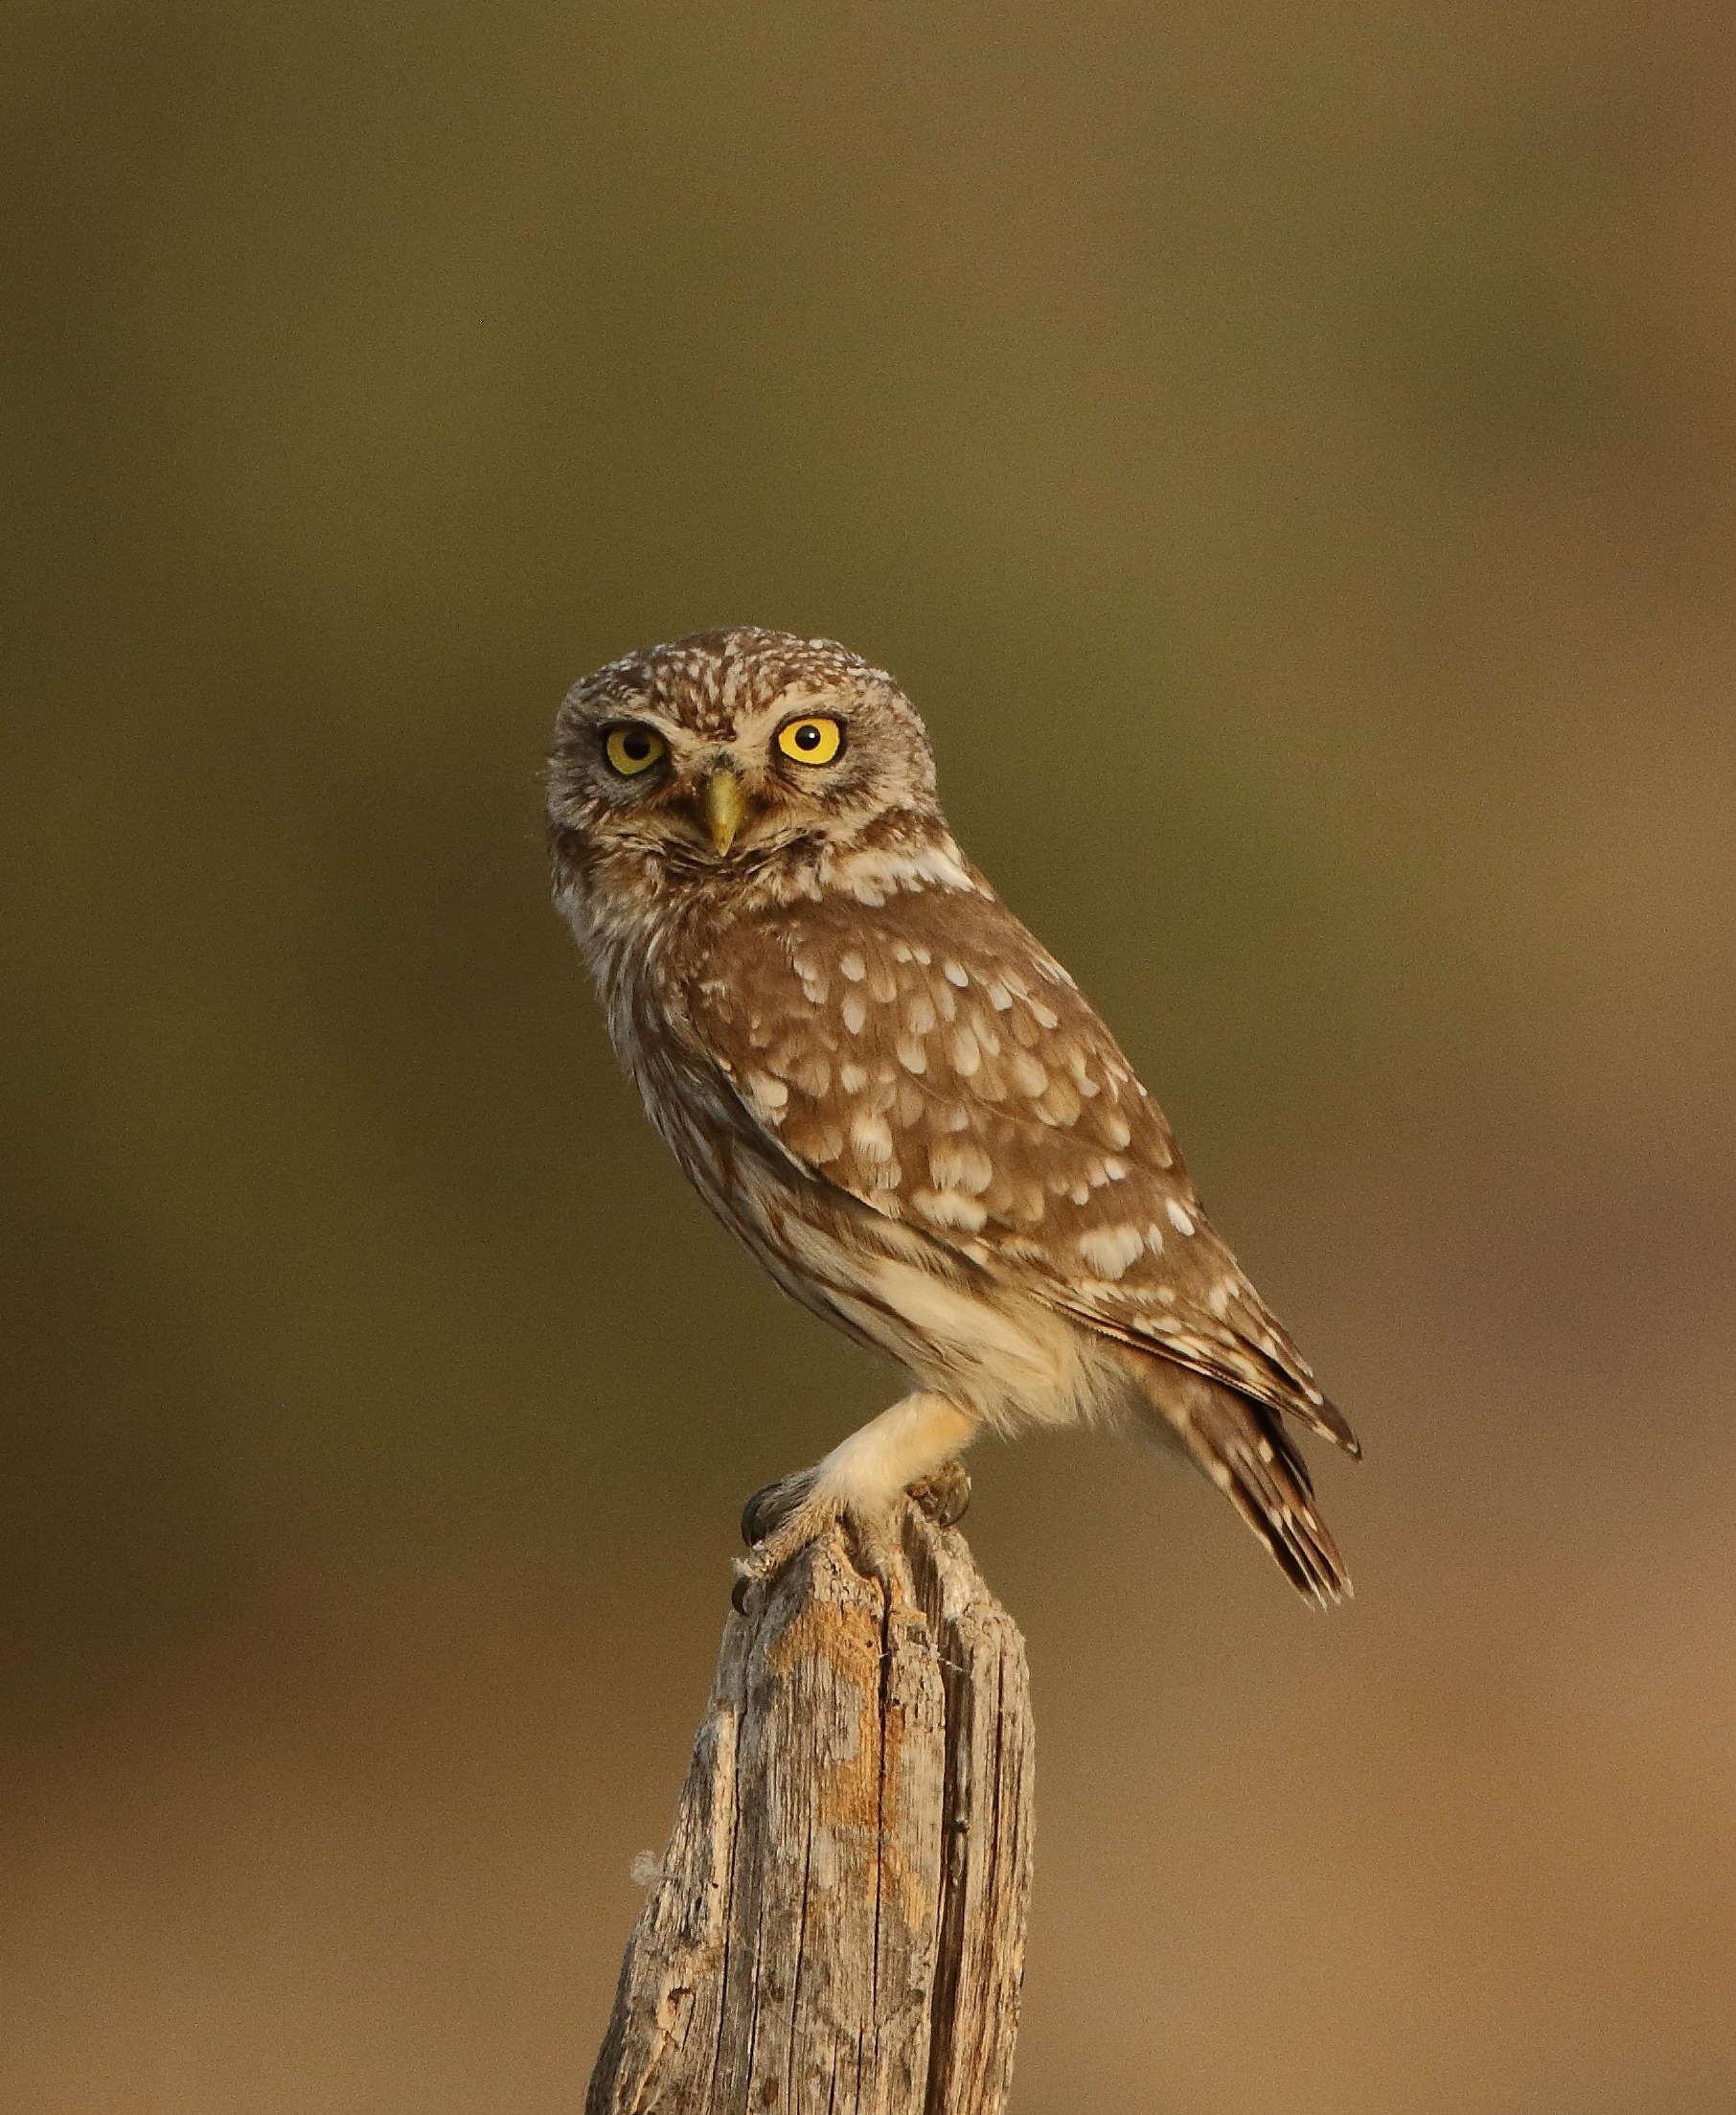 Little_Owl_Antonis_Tsaknakis_Portes_Magazine